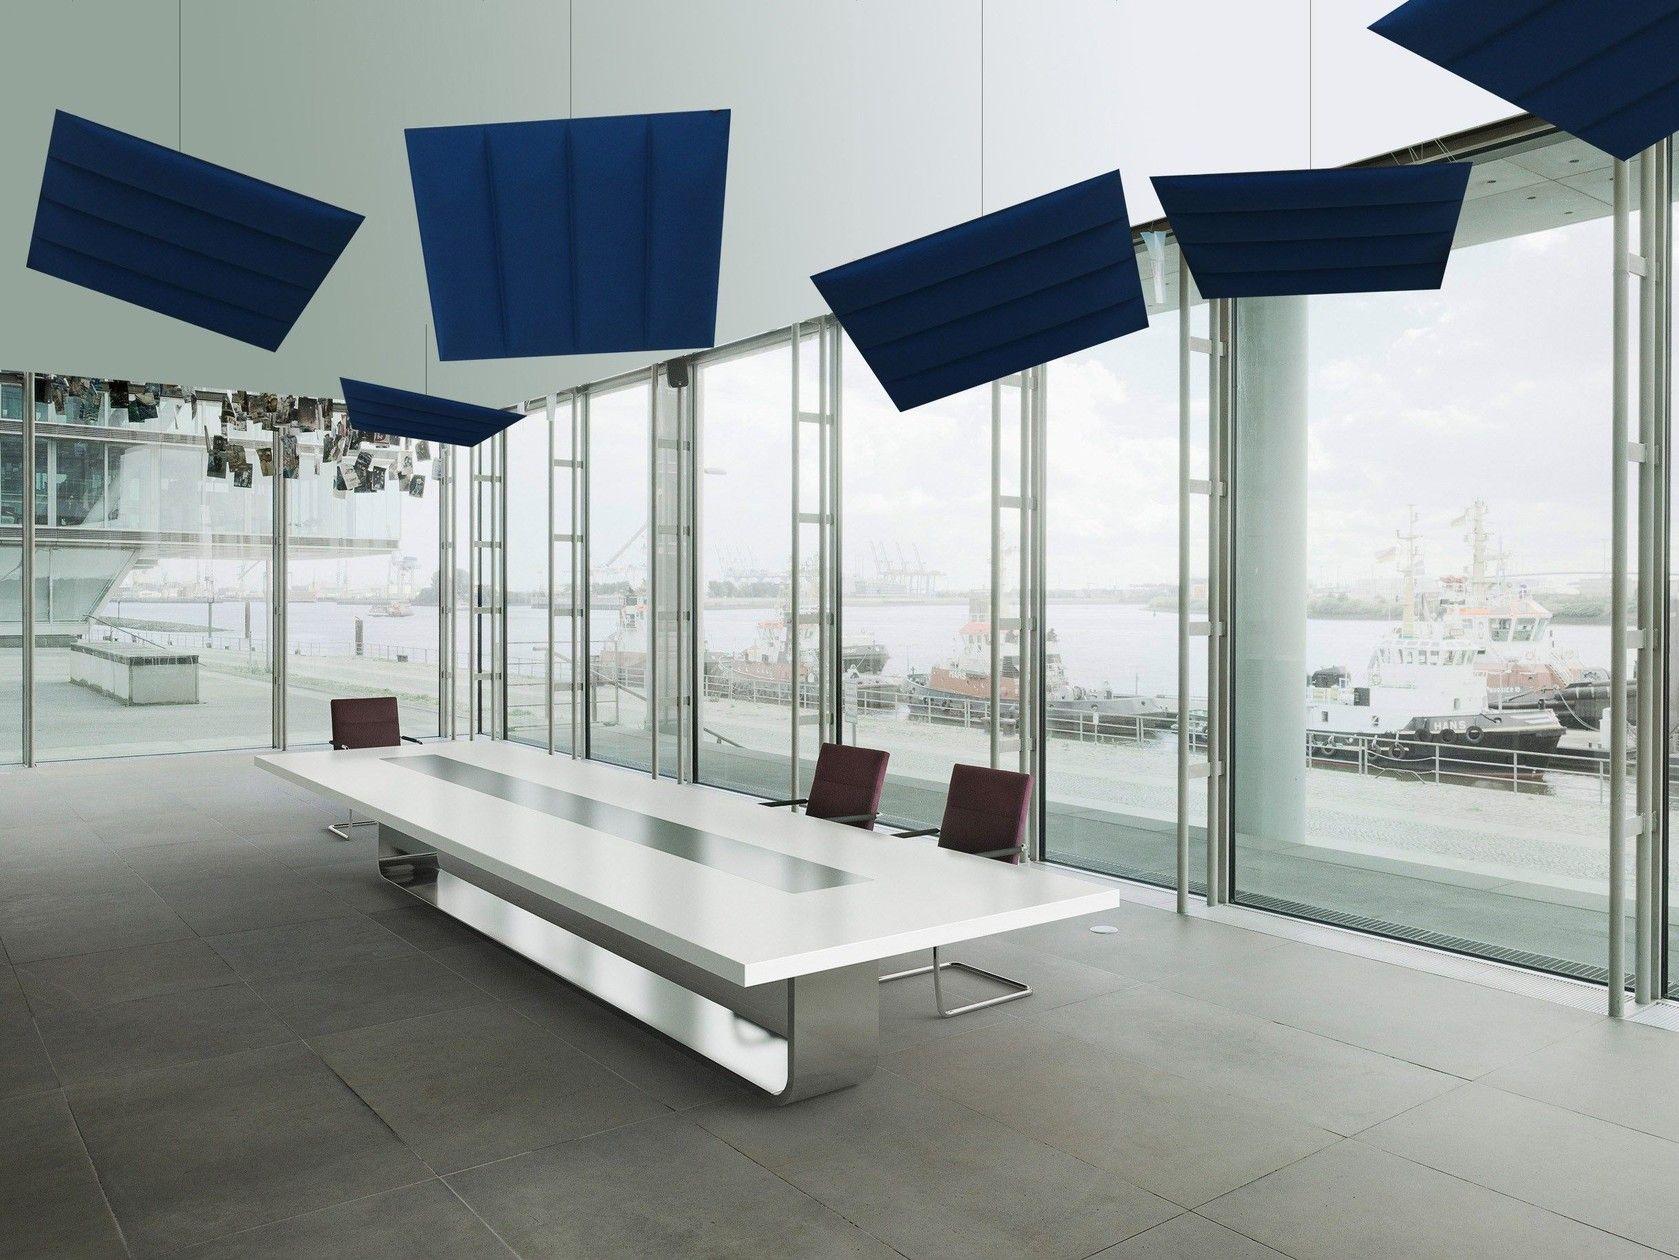 Trevira Cs Hanging Acoustical Panel Ecowall - Hanging Acoustical Panel